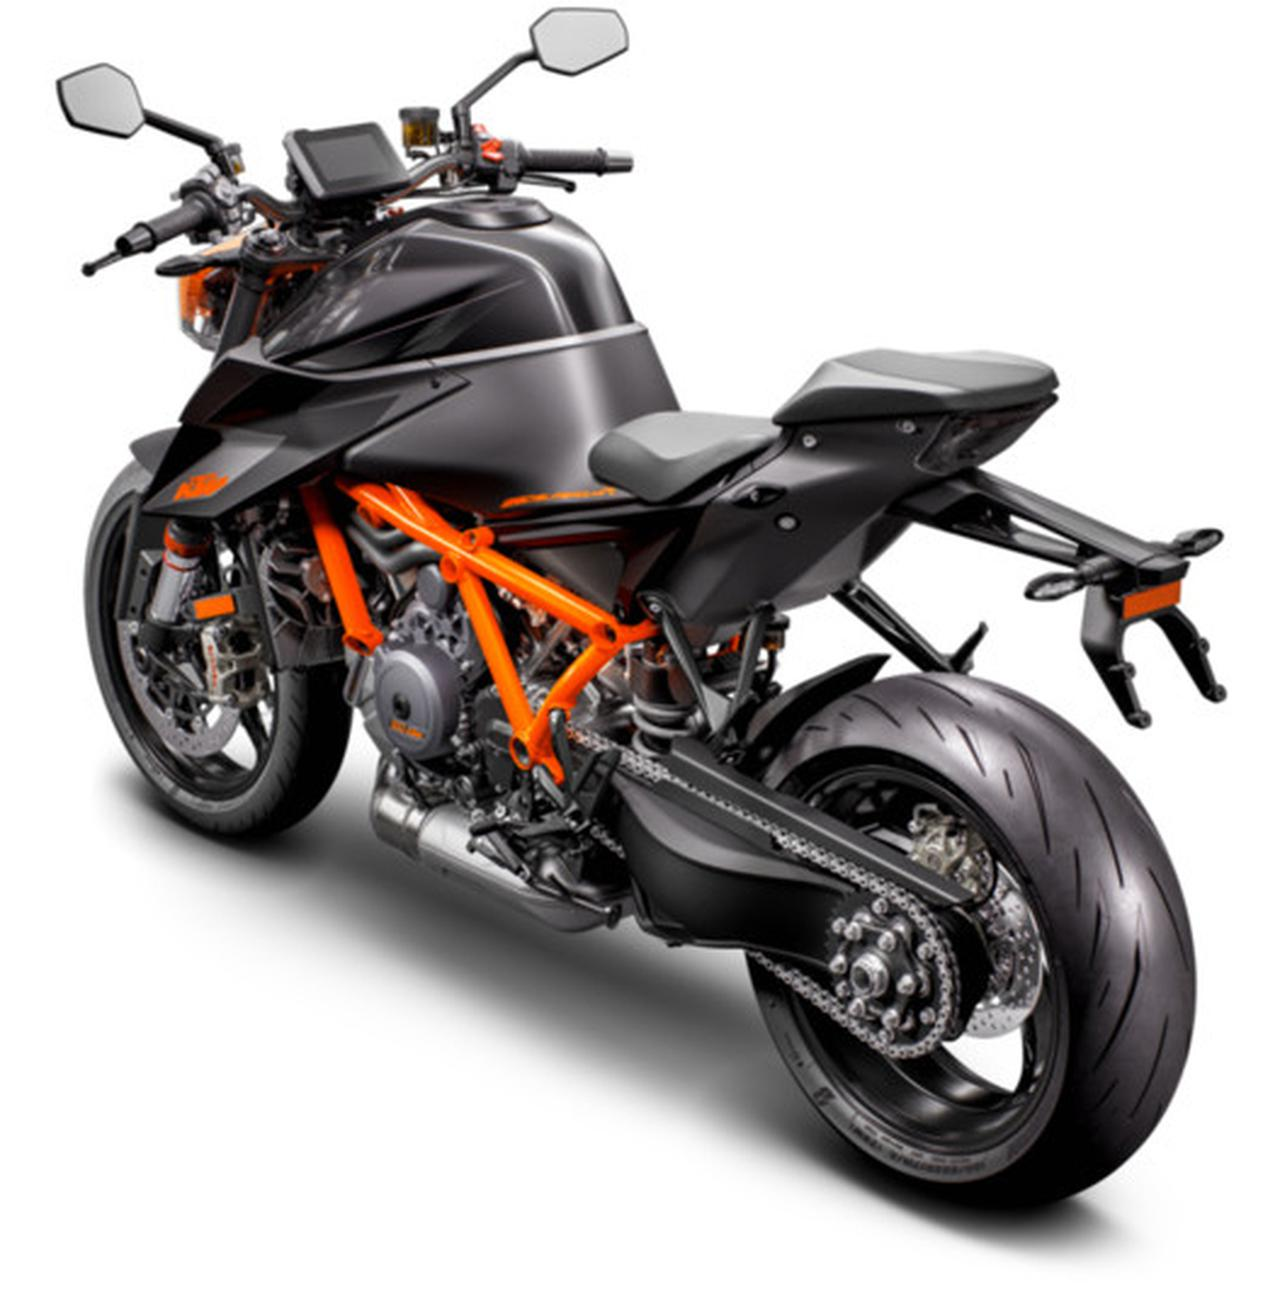 Images : 5番目の画像 - KTM「1290 SUPER DUKE R」の写真を全て見る! - webオートバイ